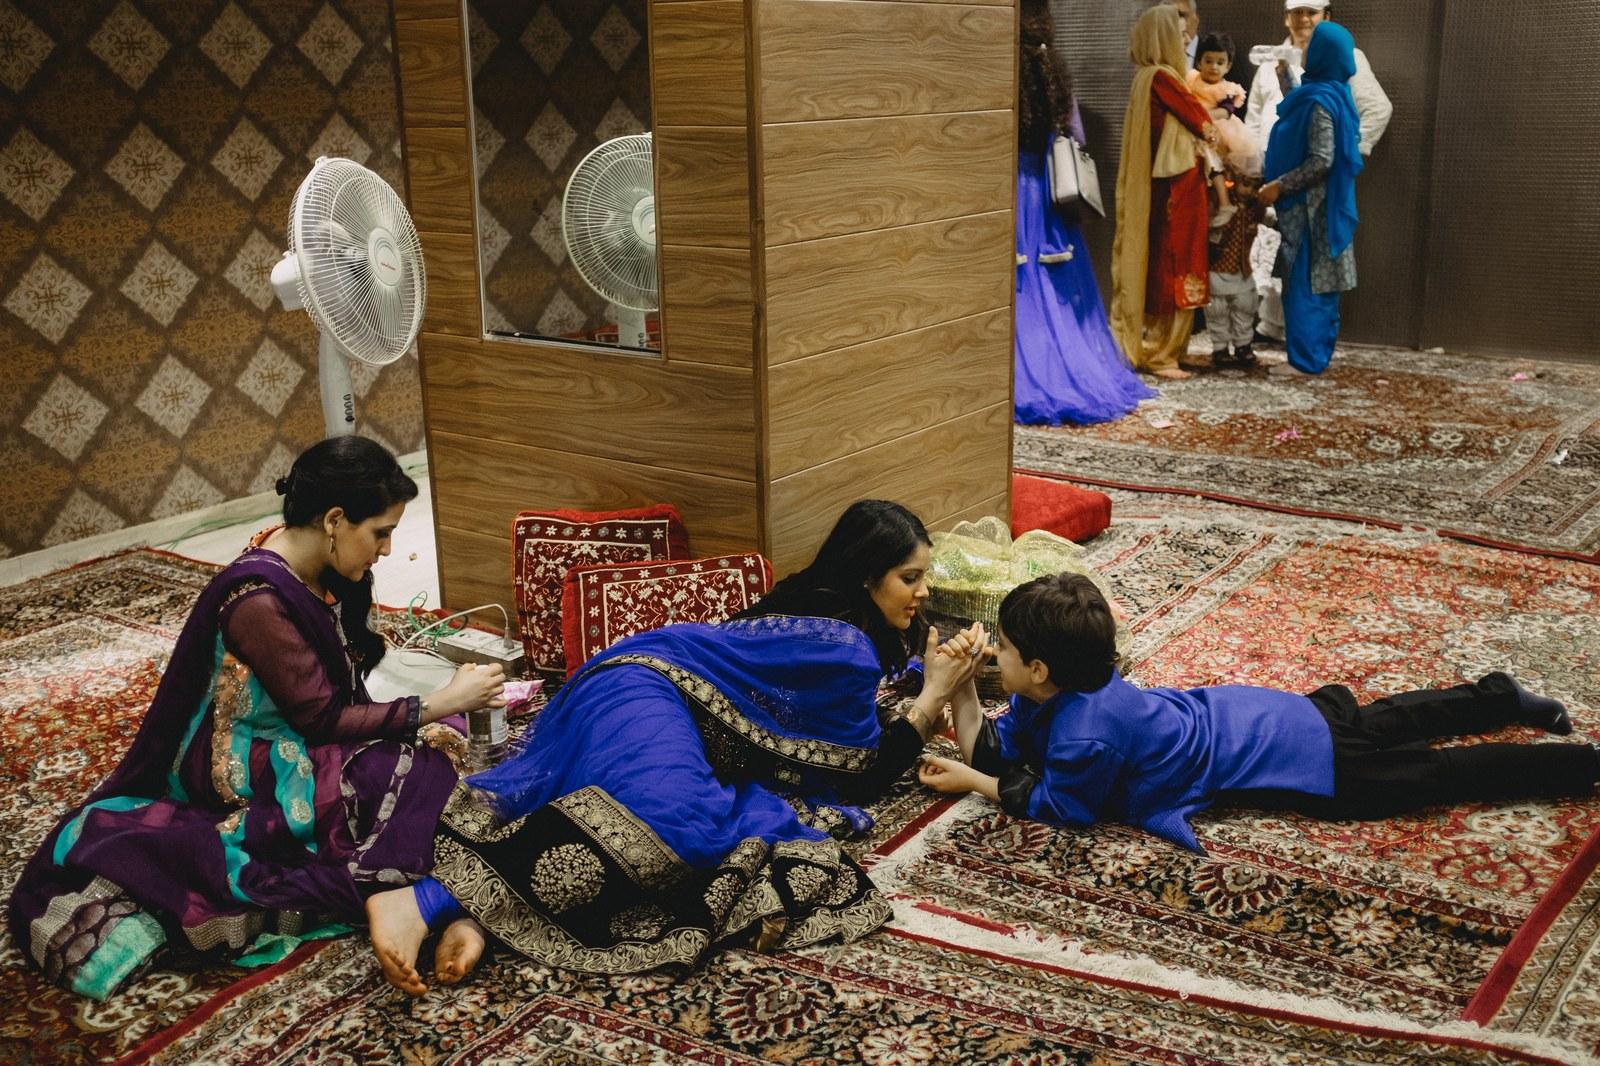 Kashmir, 2015 // Fujifilm x100s